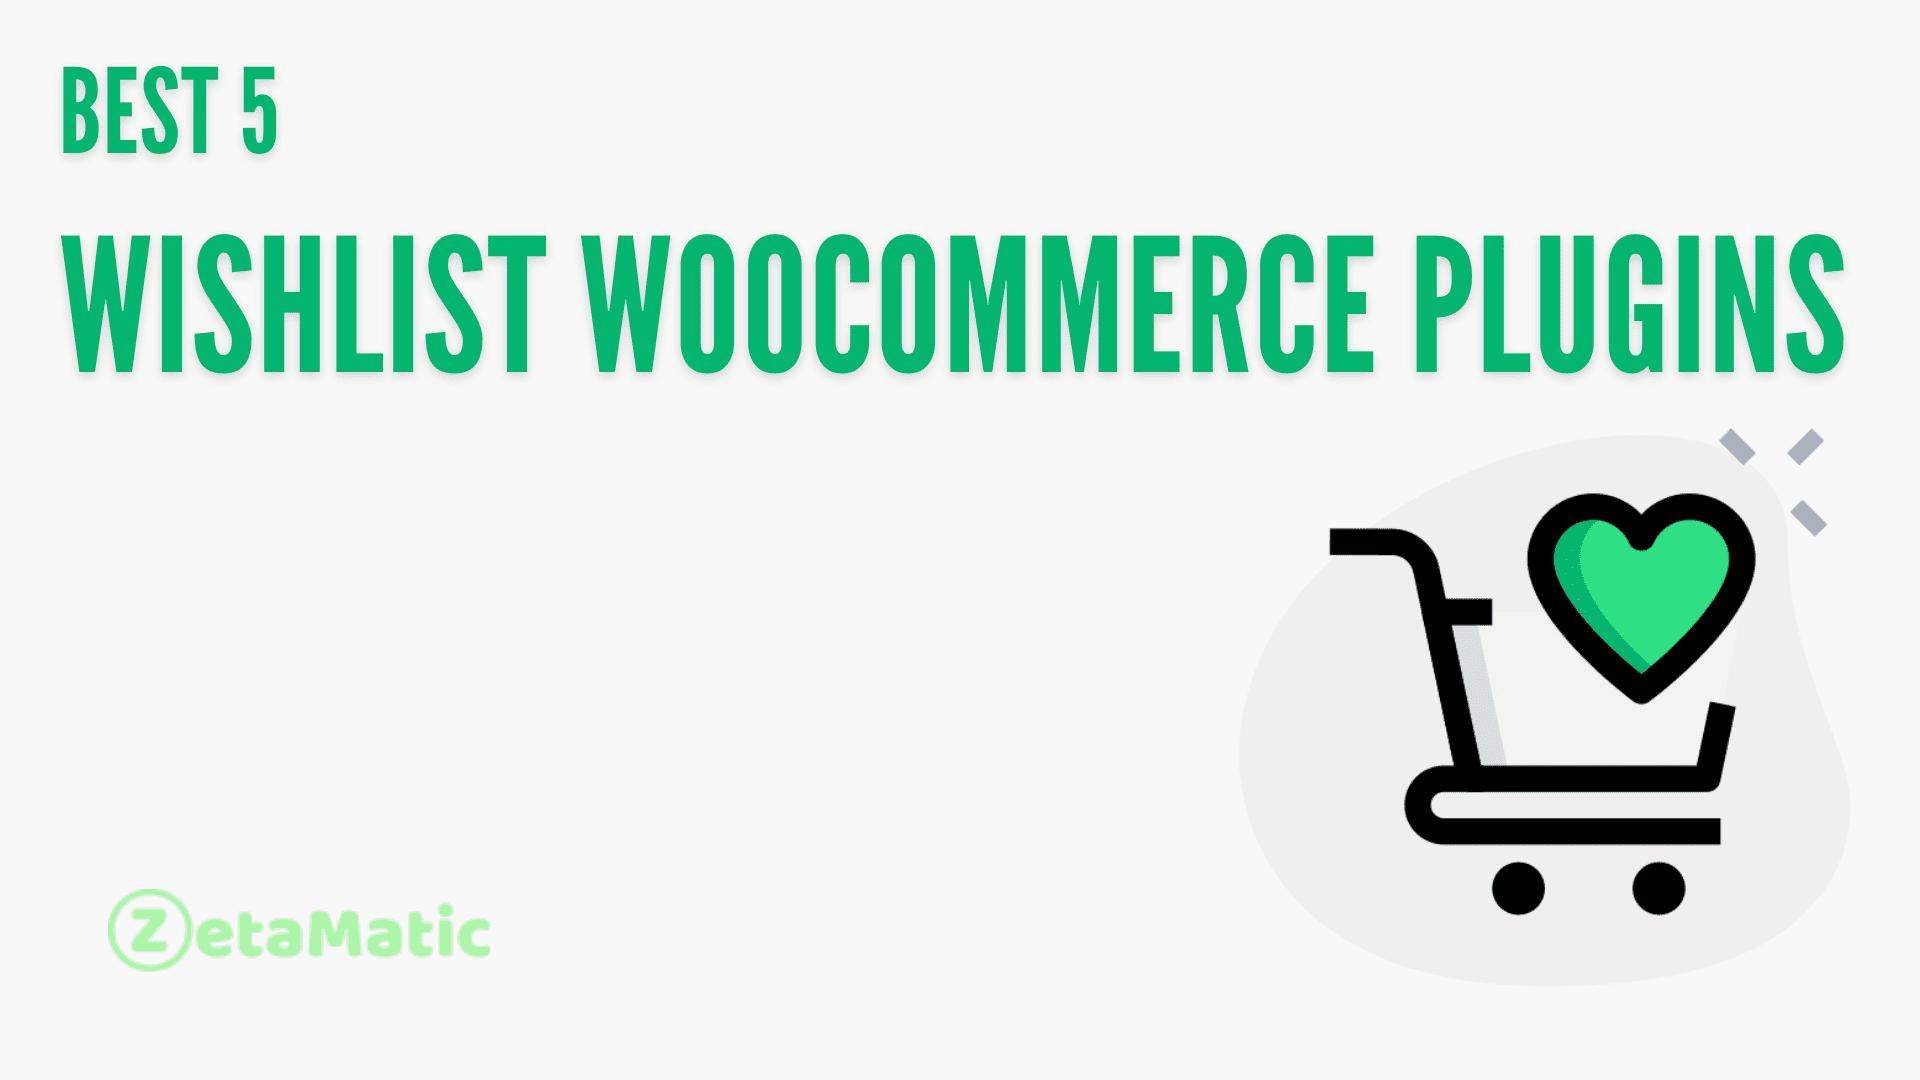 Best 5 Wishlist WooCommerce Plugins